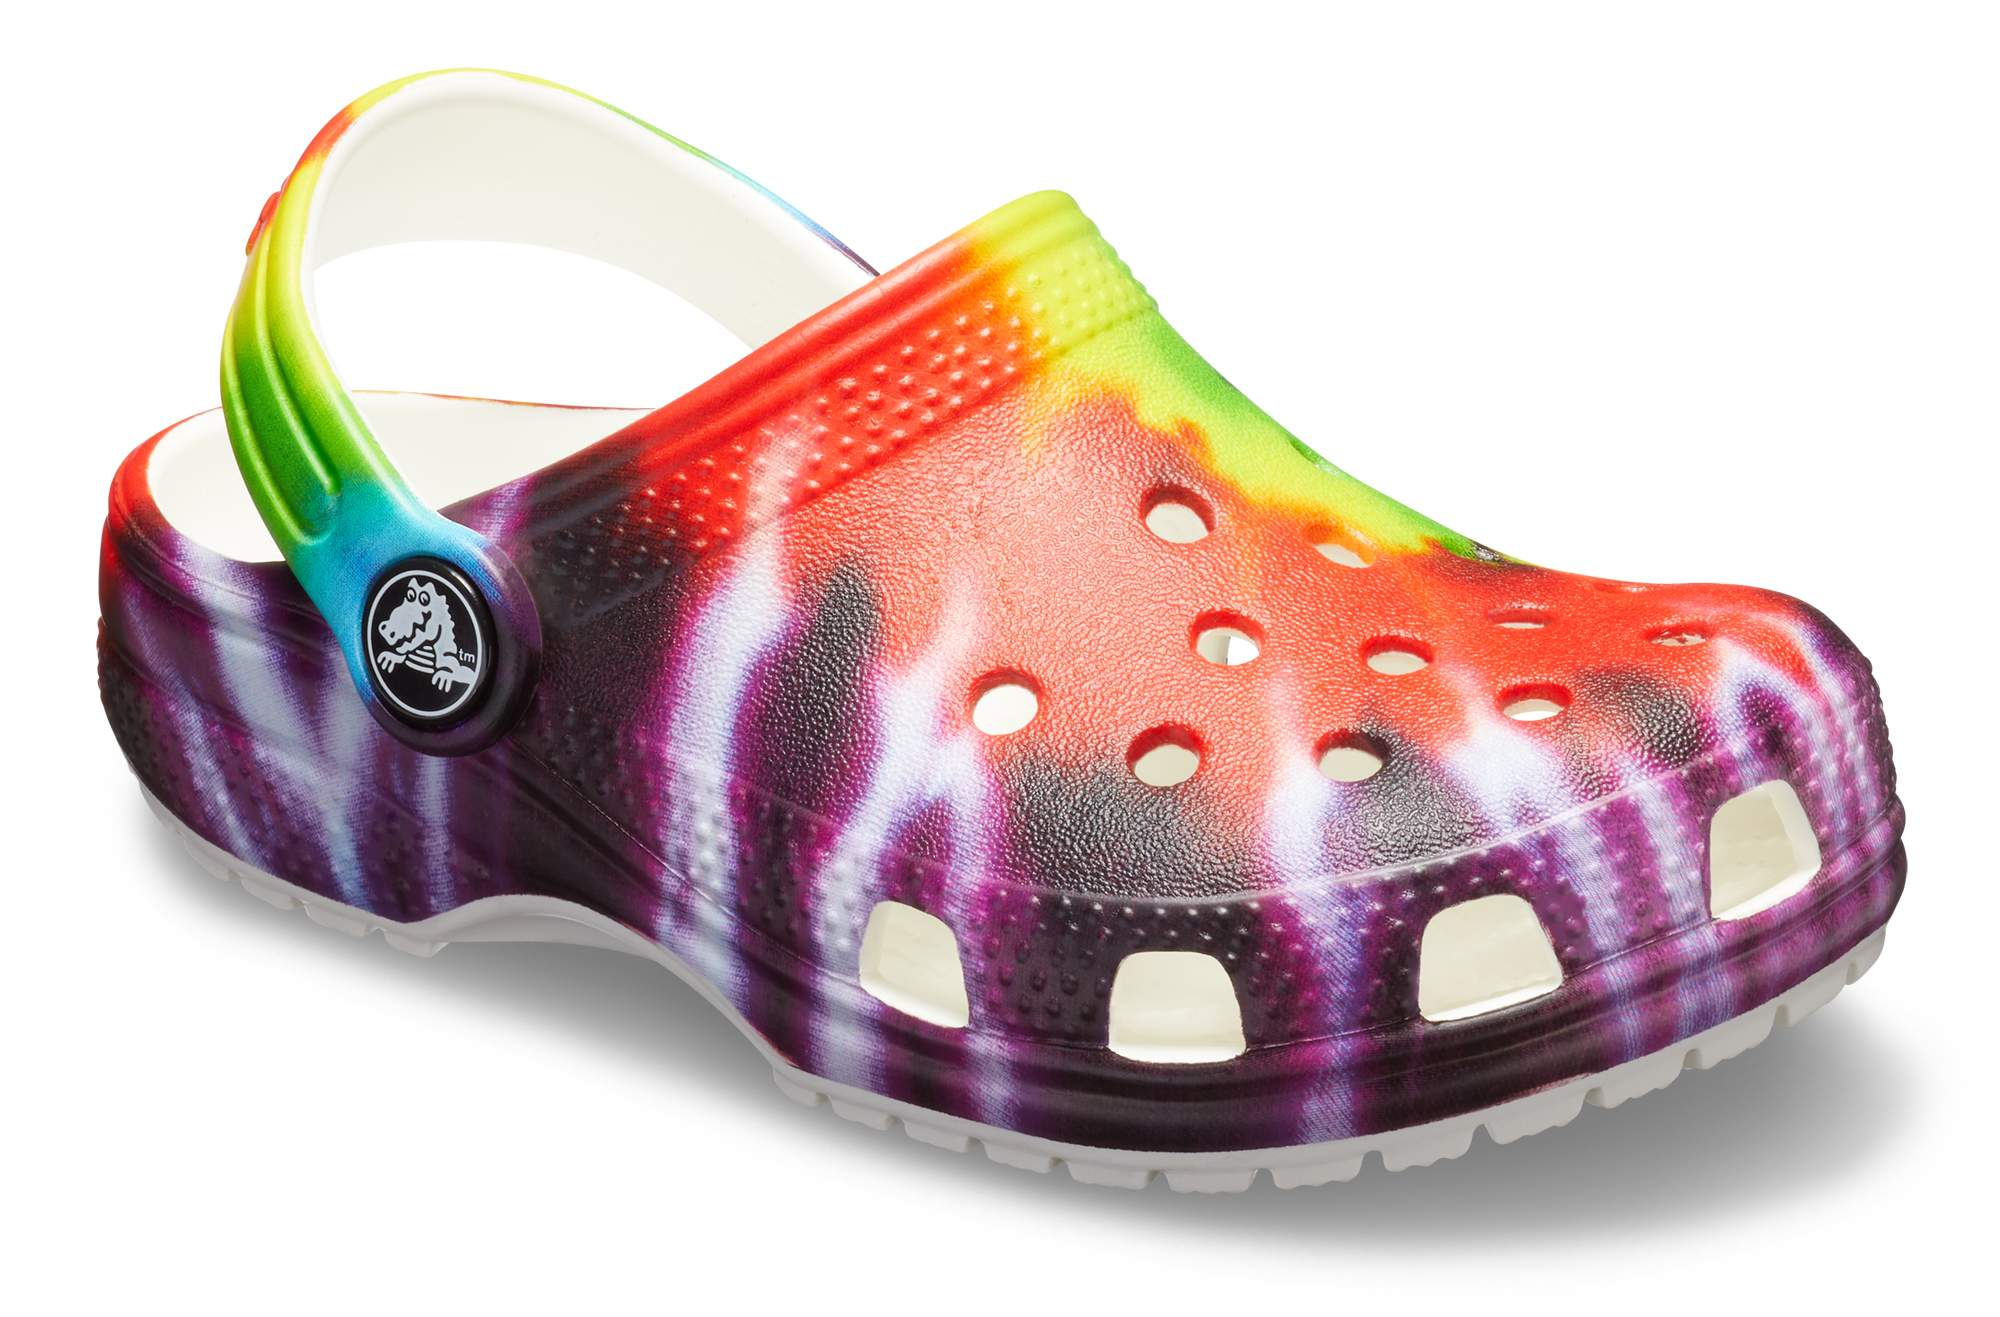 Unisex Cute Cartoon Comfortable Hole Shoes Anti Slip Water Shoes for Kids Girls Boys N//C Kids Tie Dye Clog